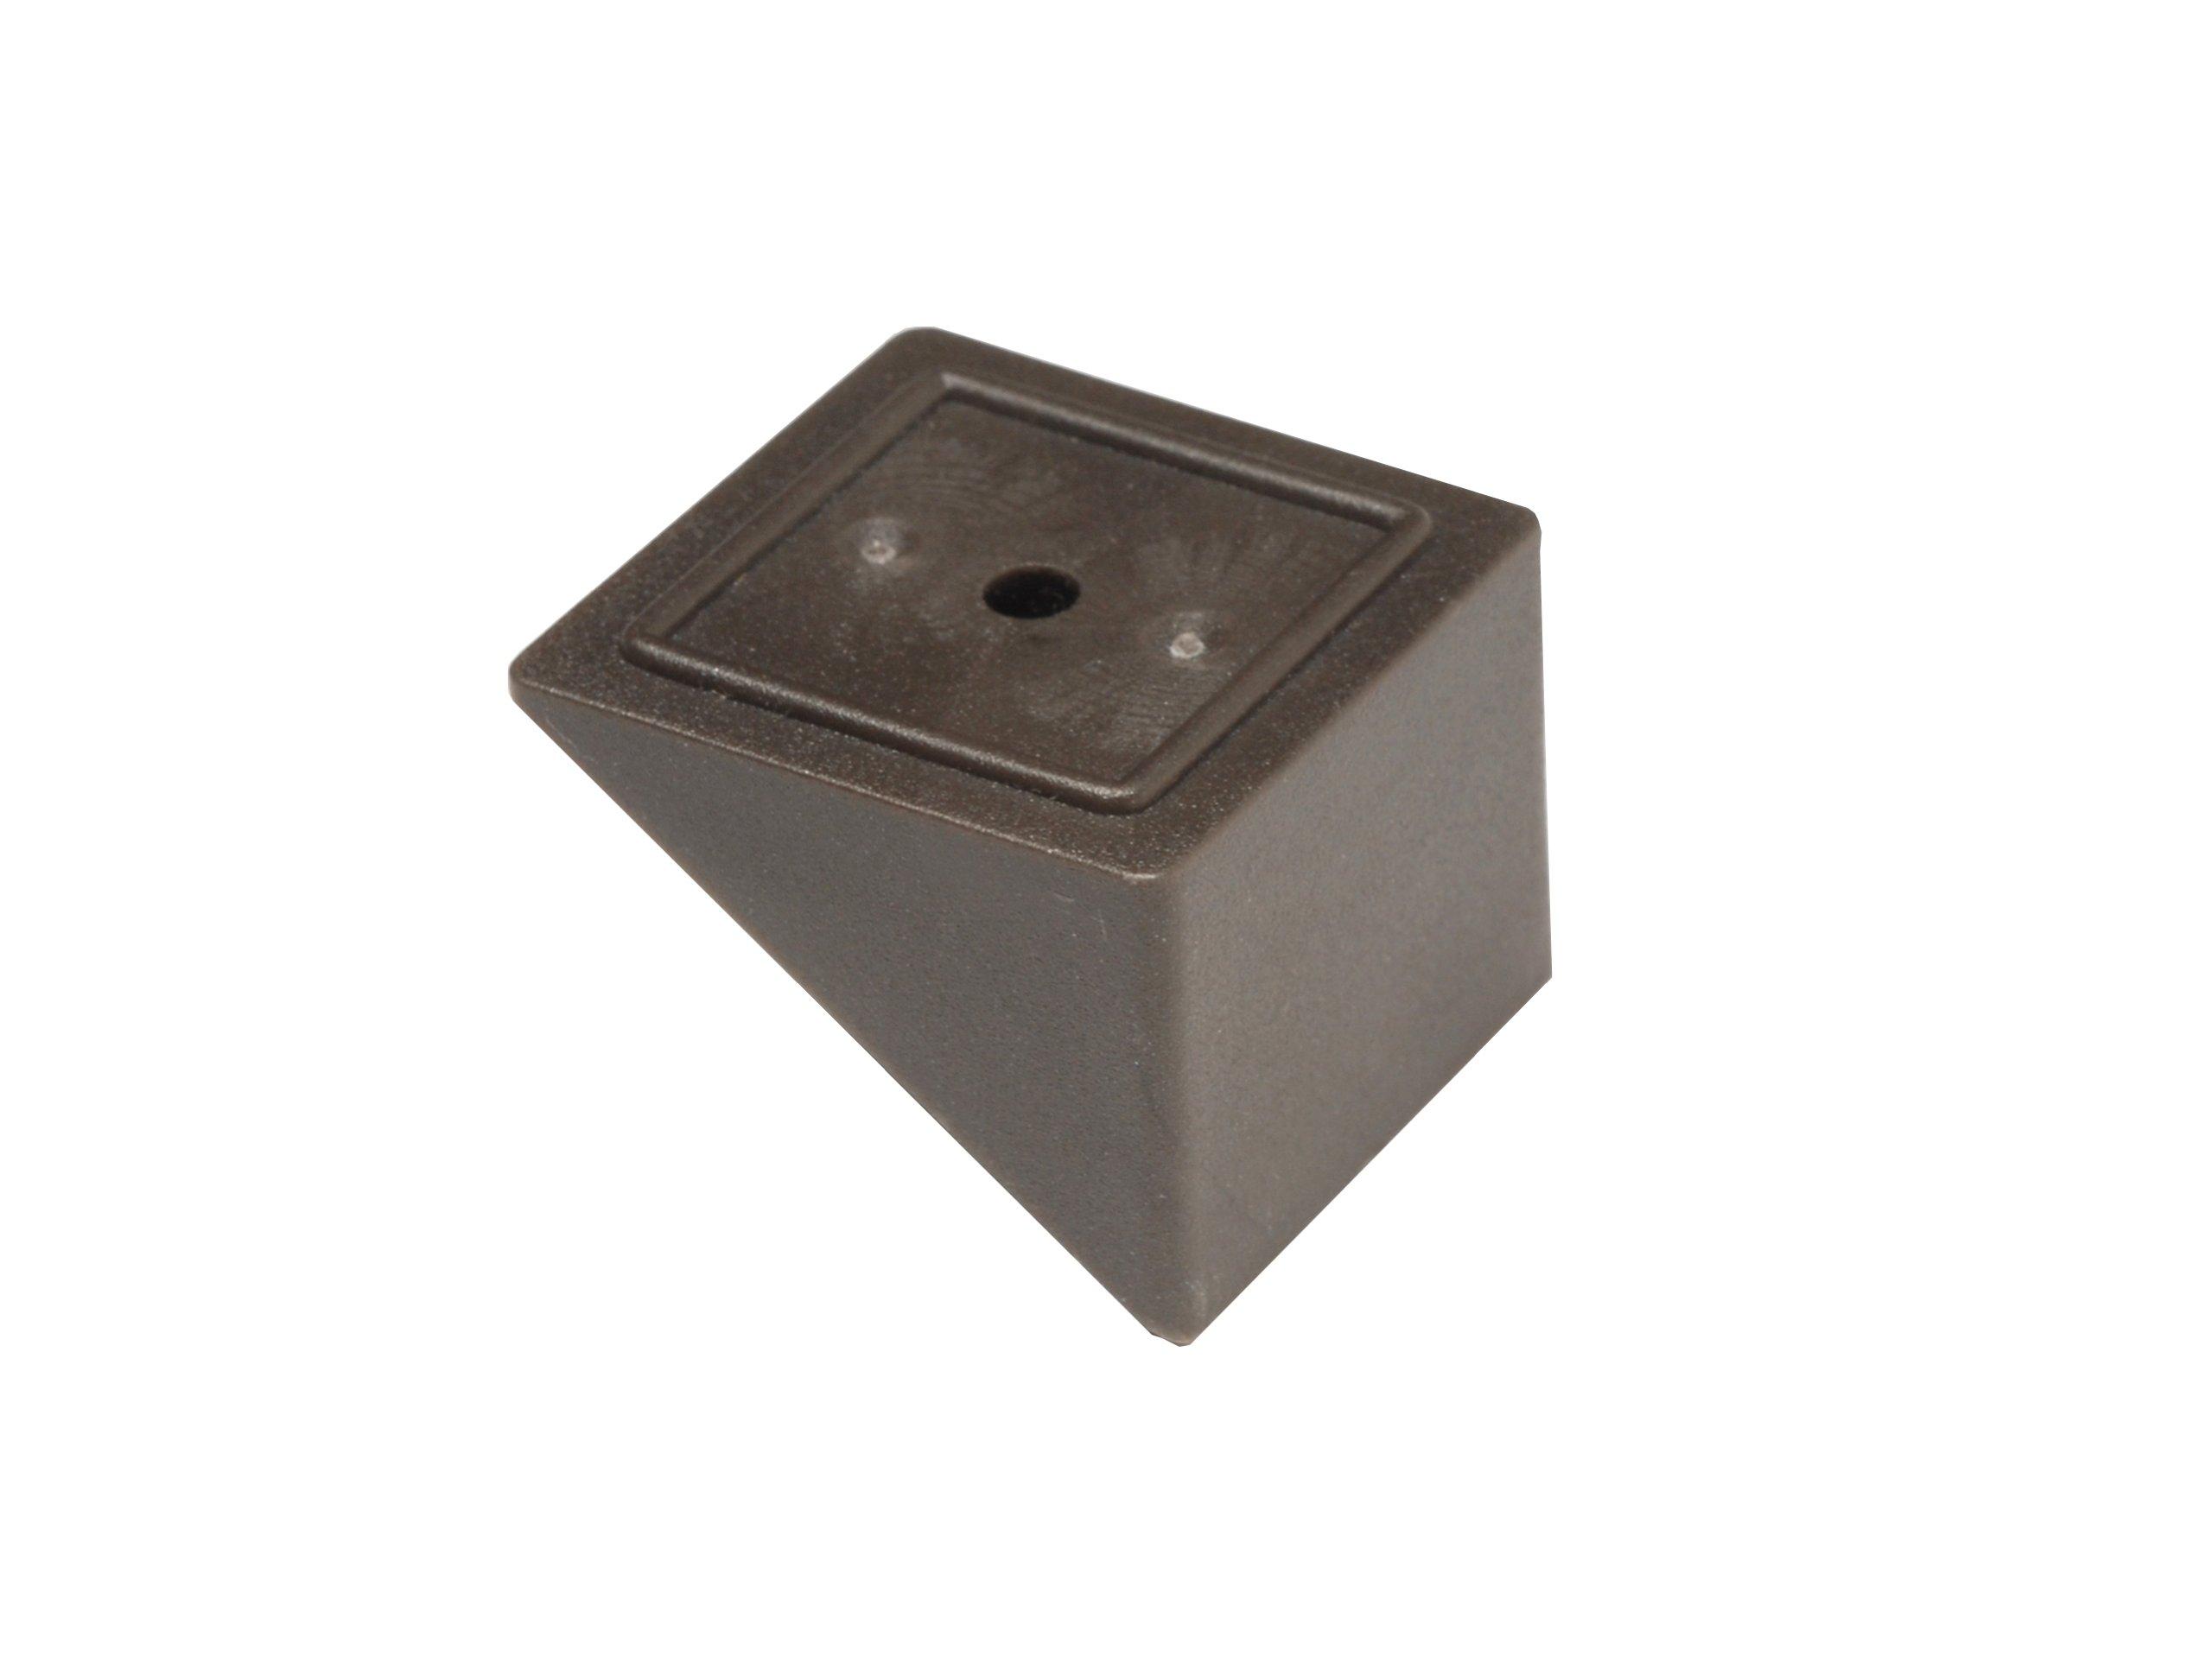 Deckorators 95882 Estate Stair Adapter with Screws, Bronze, 20-Pack